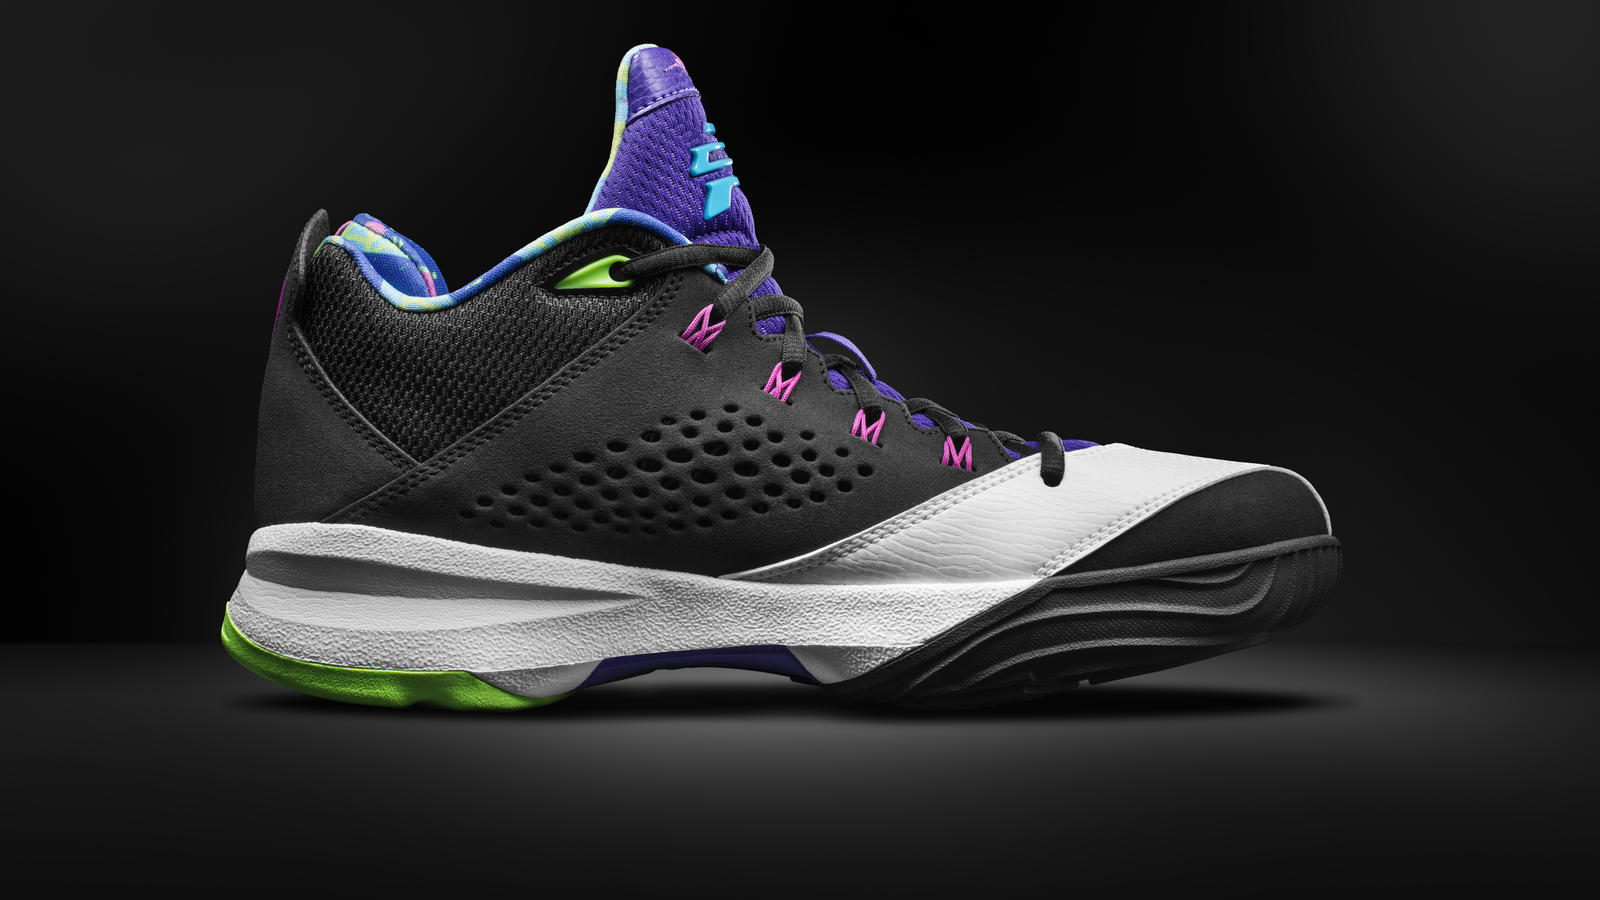 Jordan CP3.VII Black/White-Flash Lime -Medial View